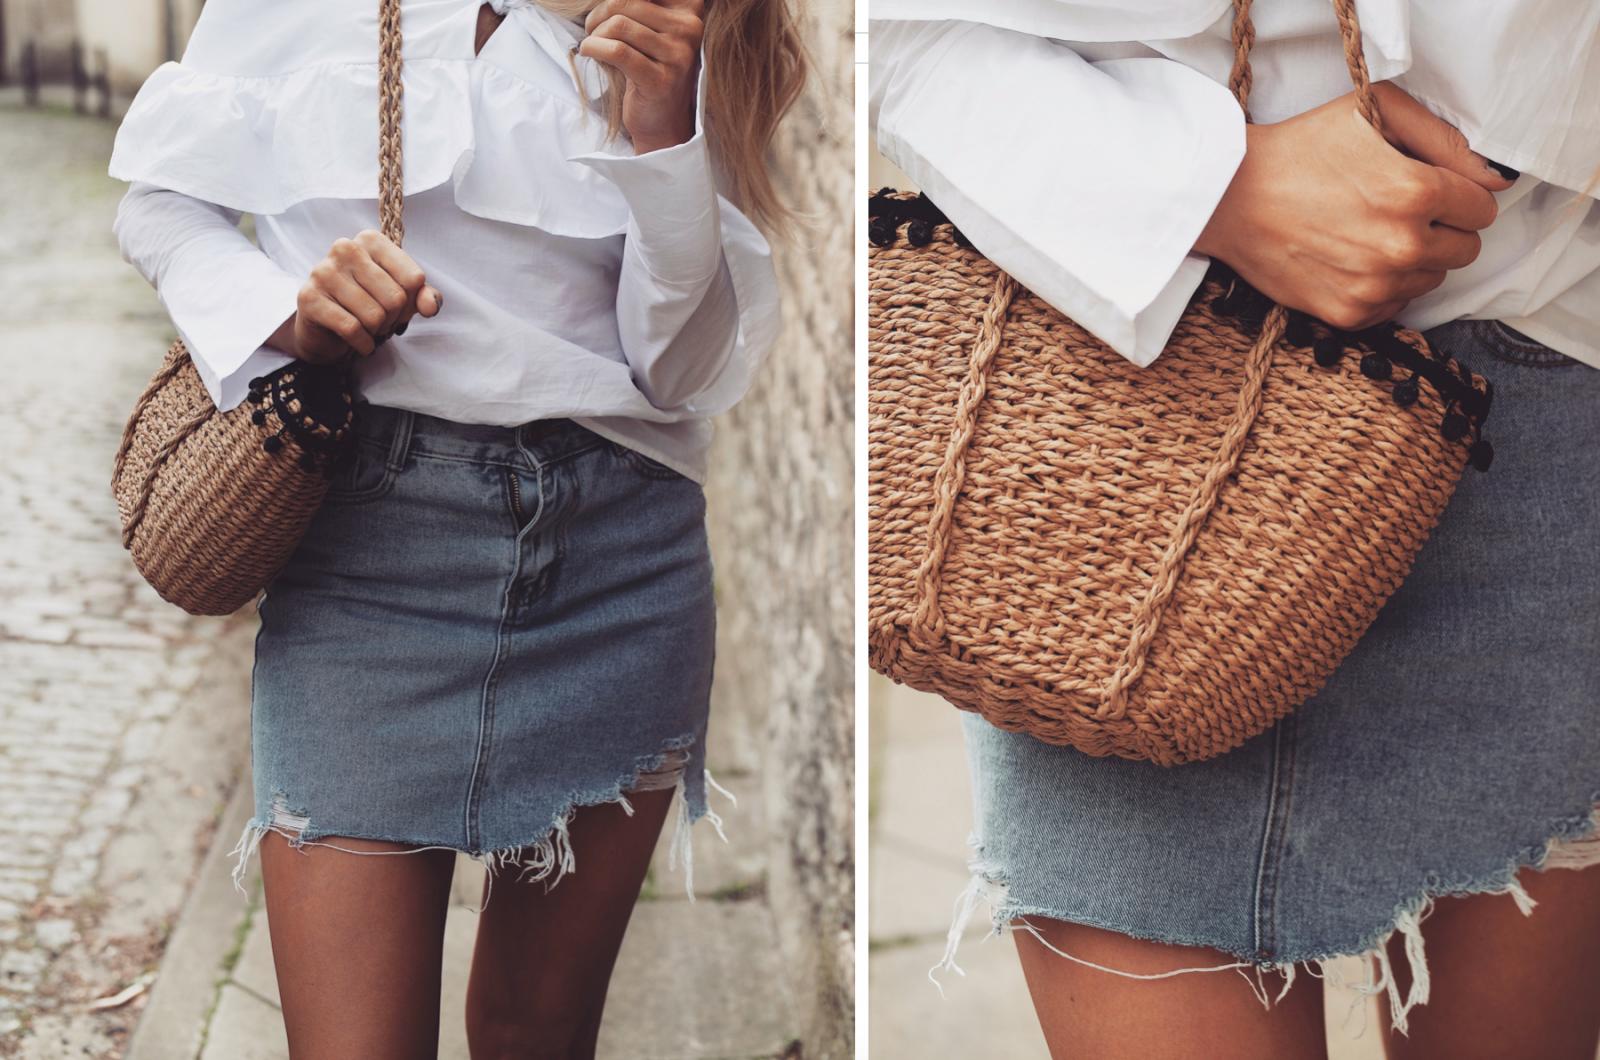 Love Sheinside - Woven Bag